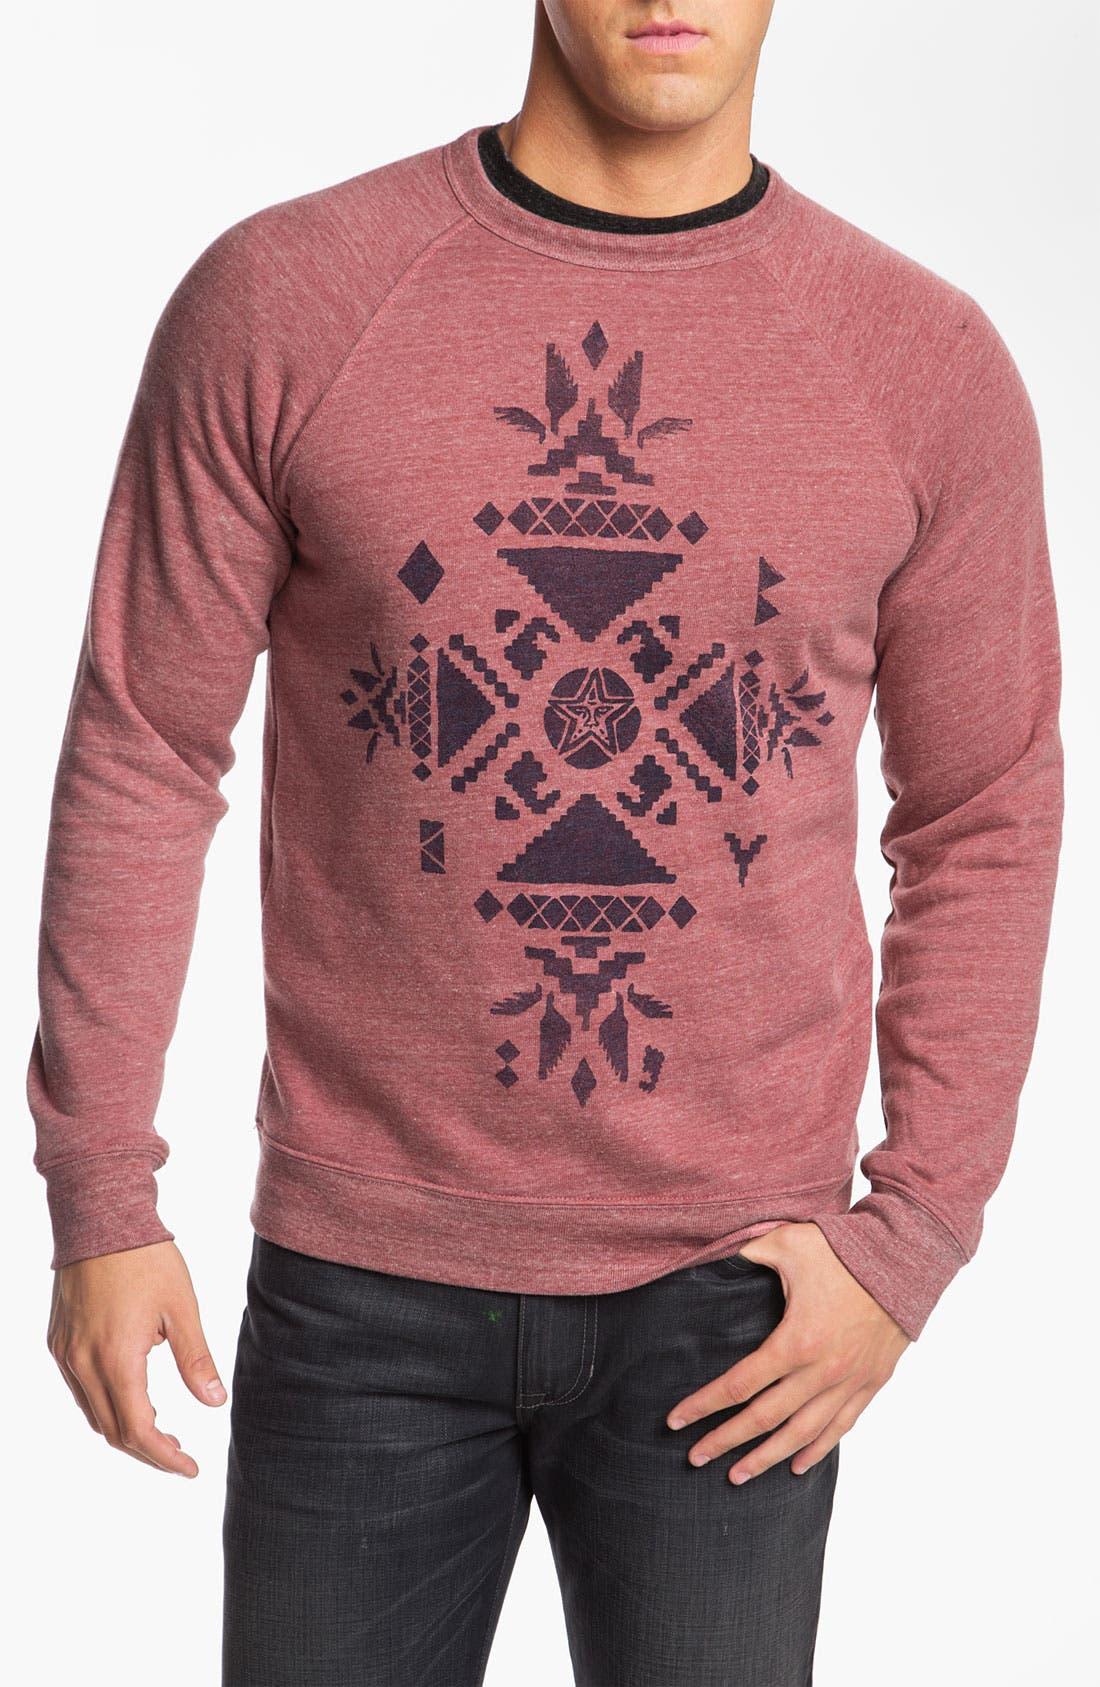 Alternate Image 1 Selected - Obey 'Desert Star' Graphic Crewneck Sweatshirt